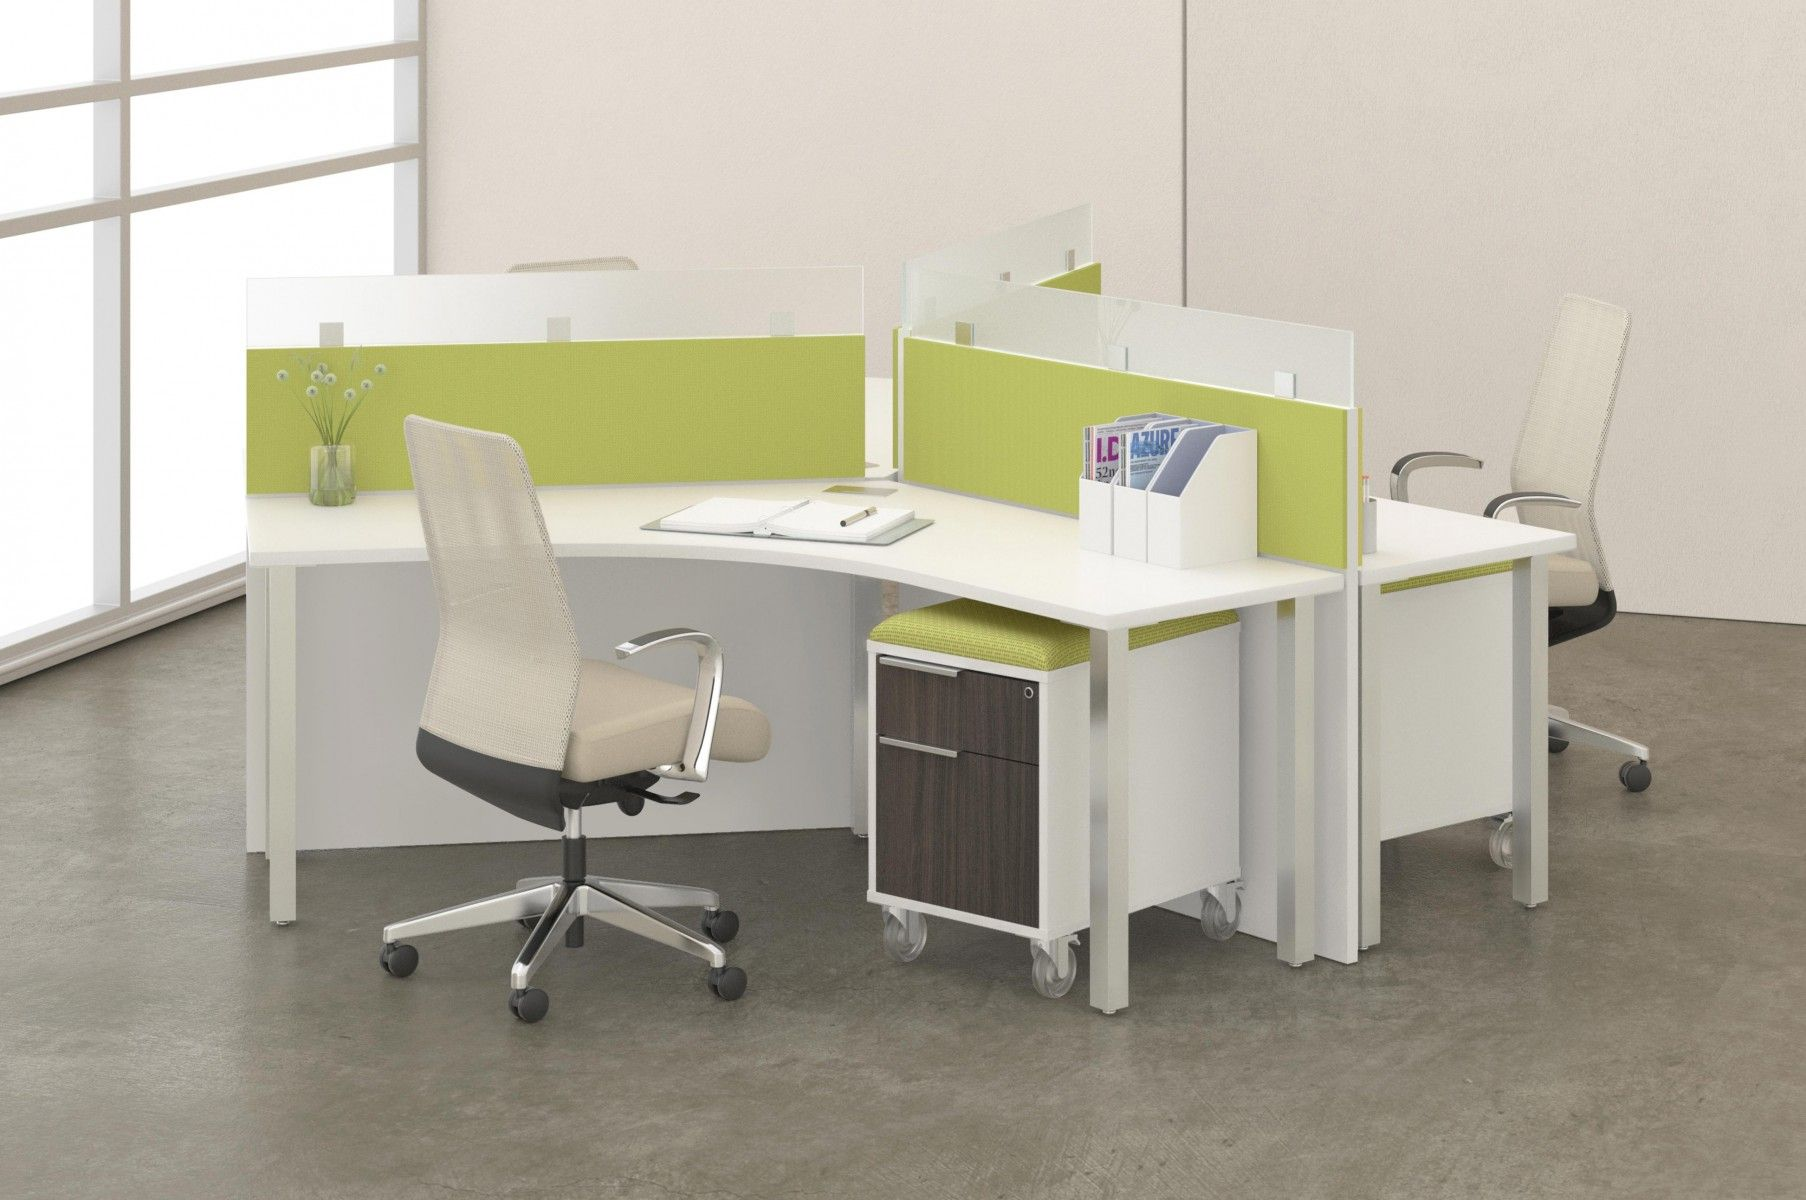 Www Alandesk Com Teamworx By Deskmakers Office Furniture Modern